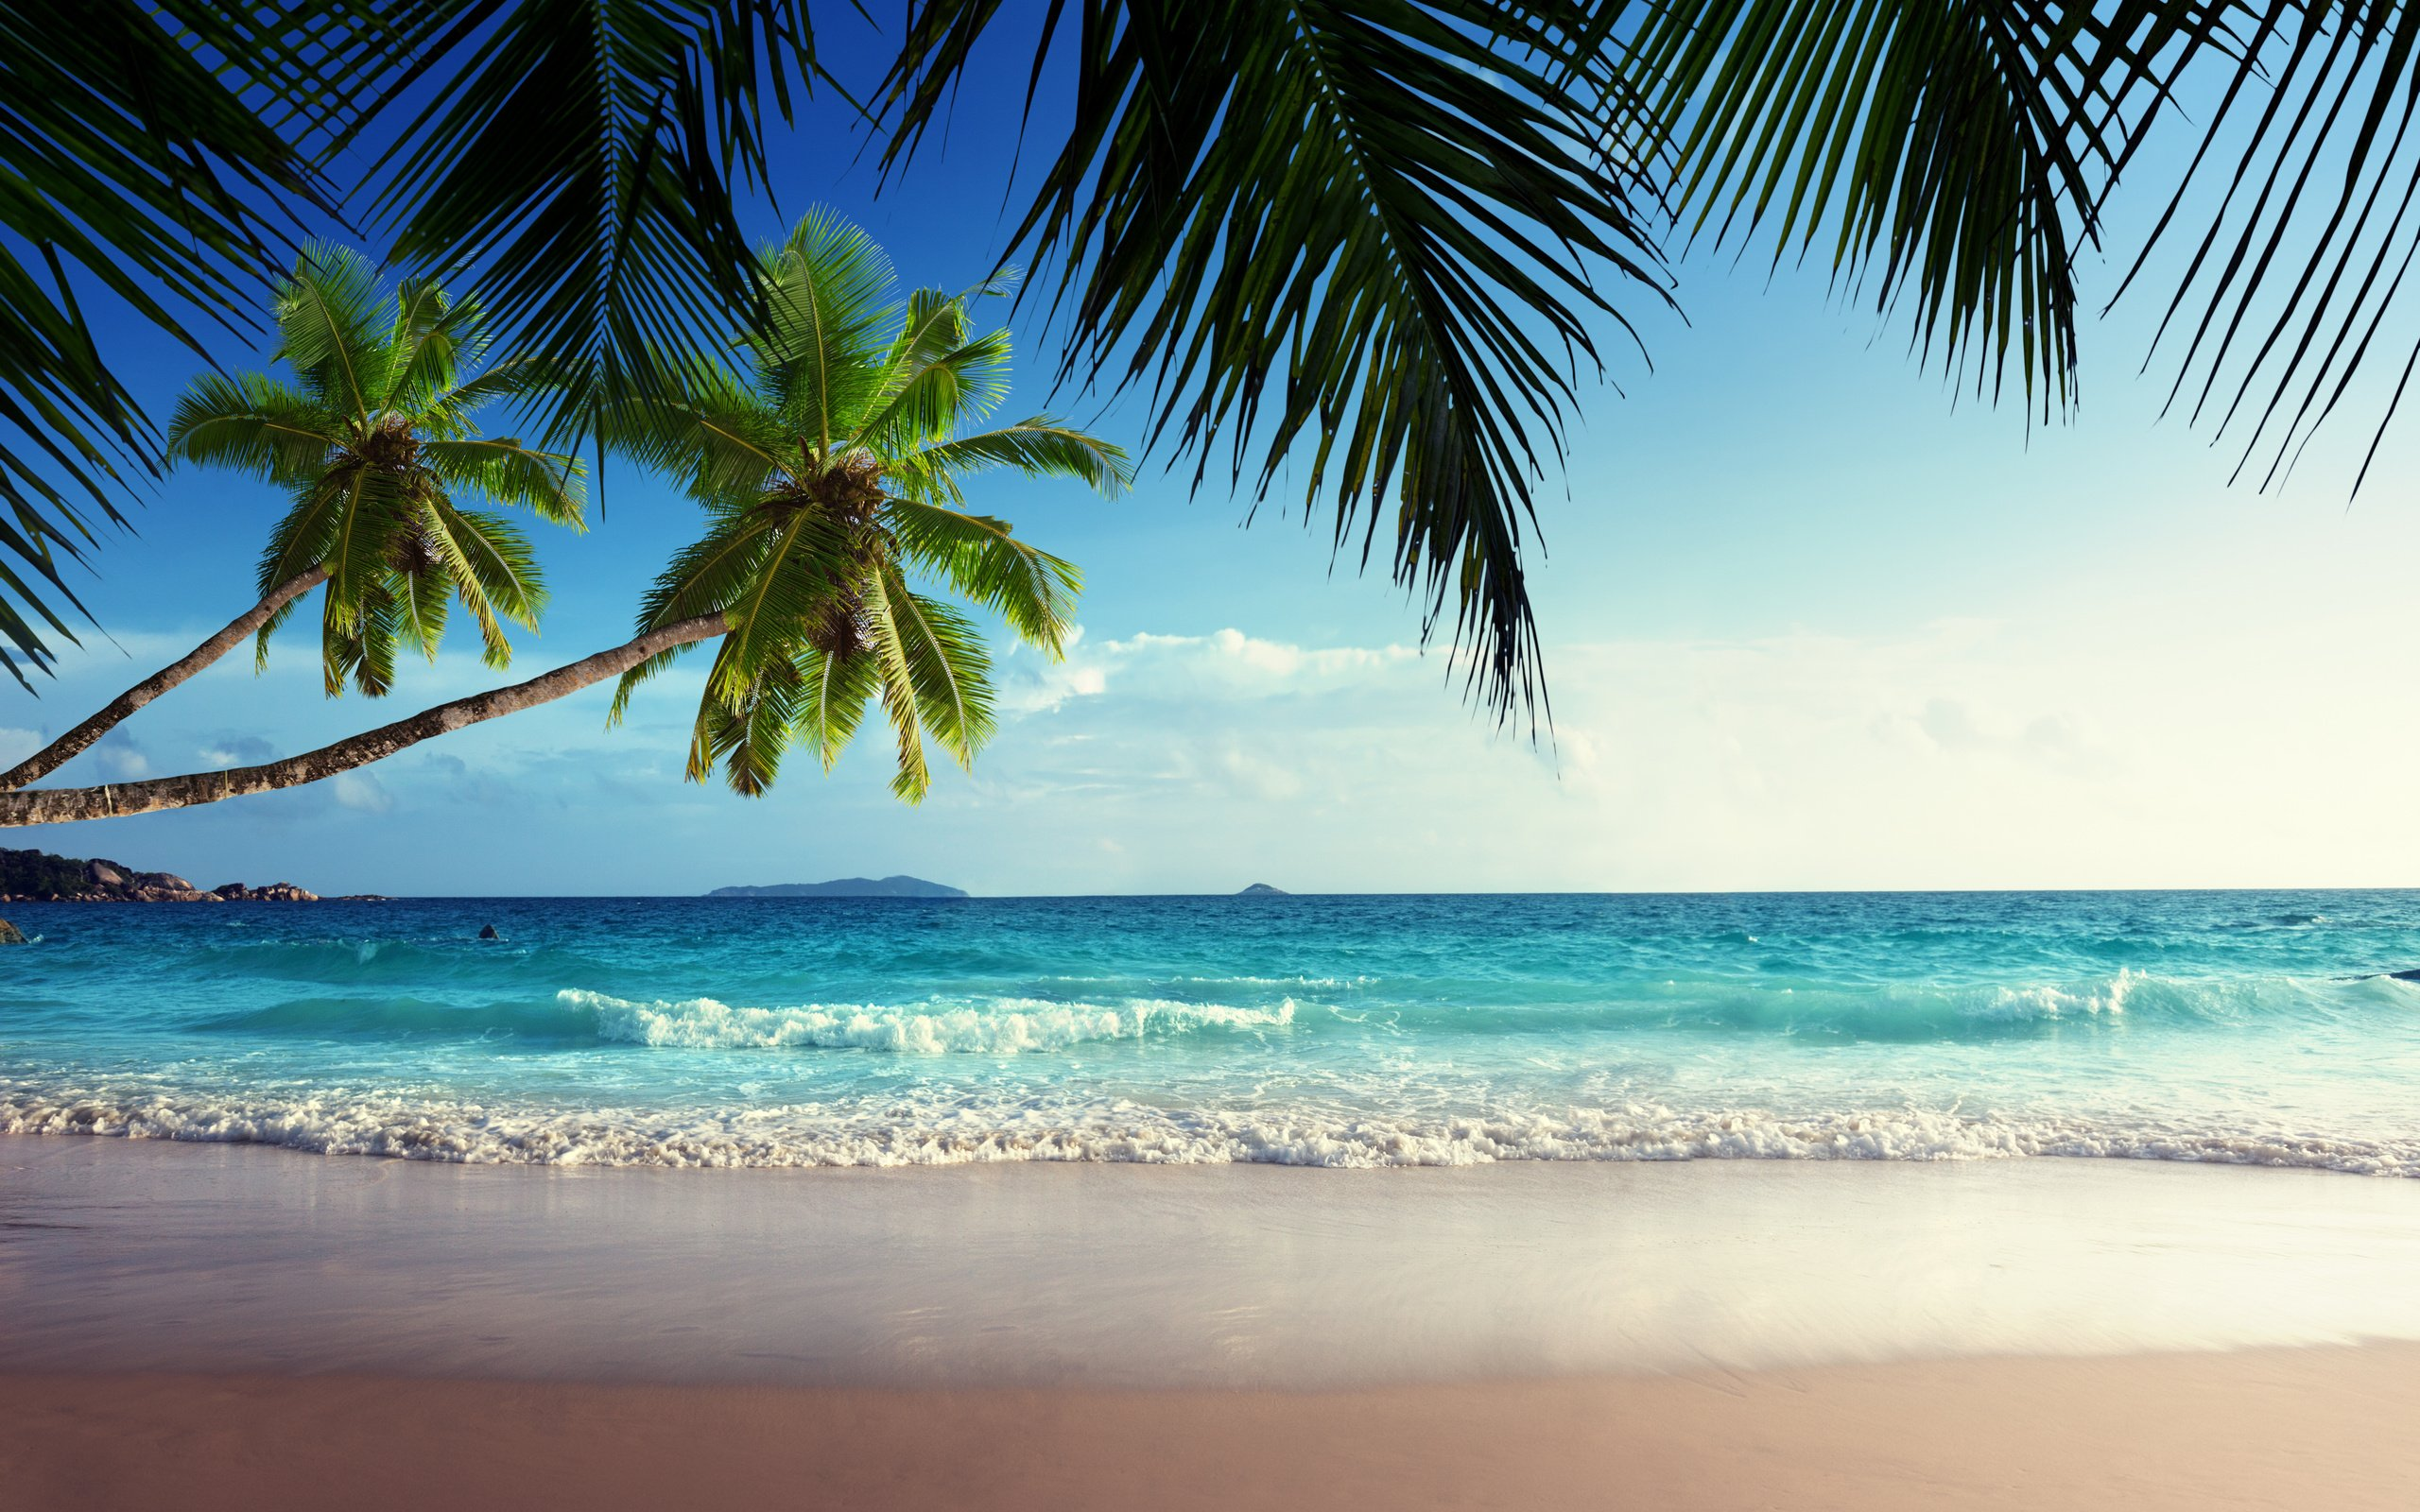 Tropical Beach Paradise Beautiful Pictures Tropical Beach Paradise ...